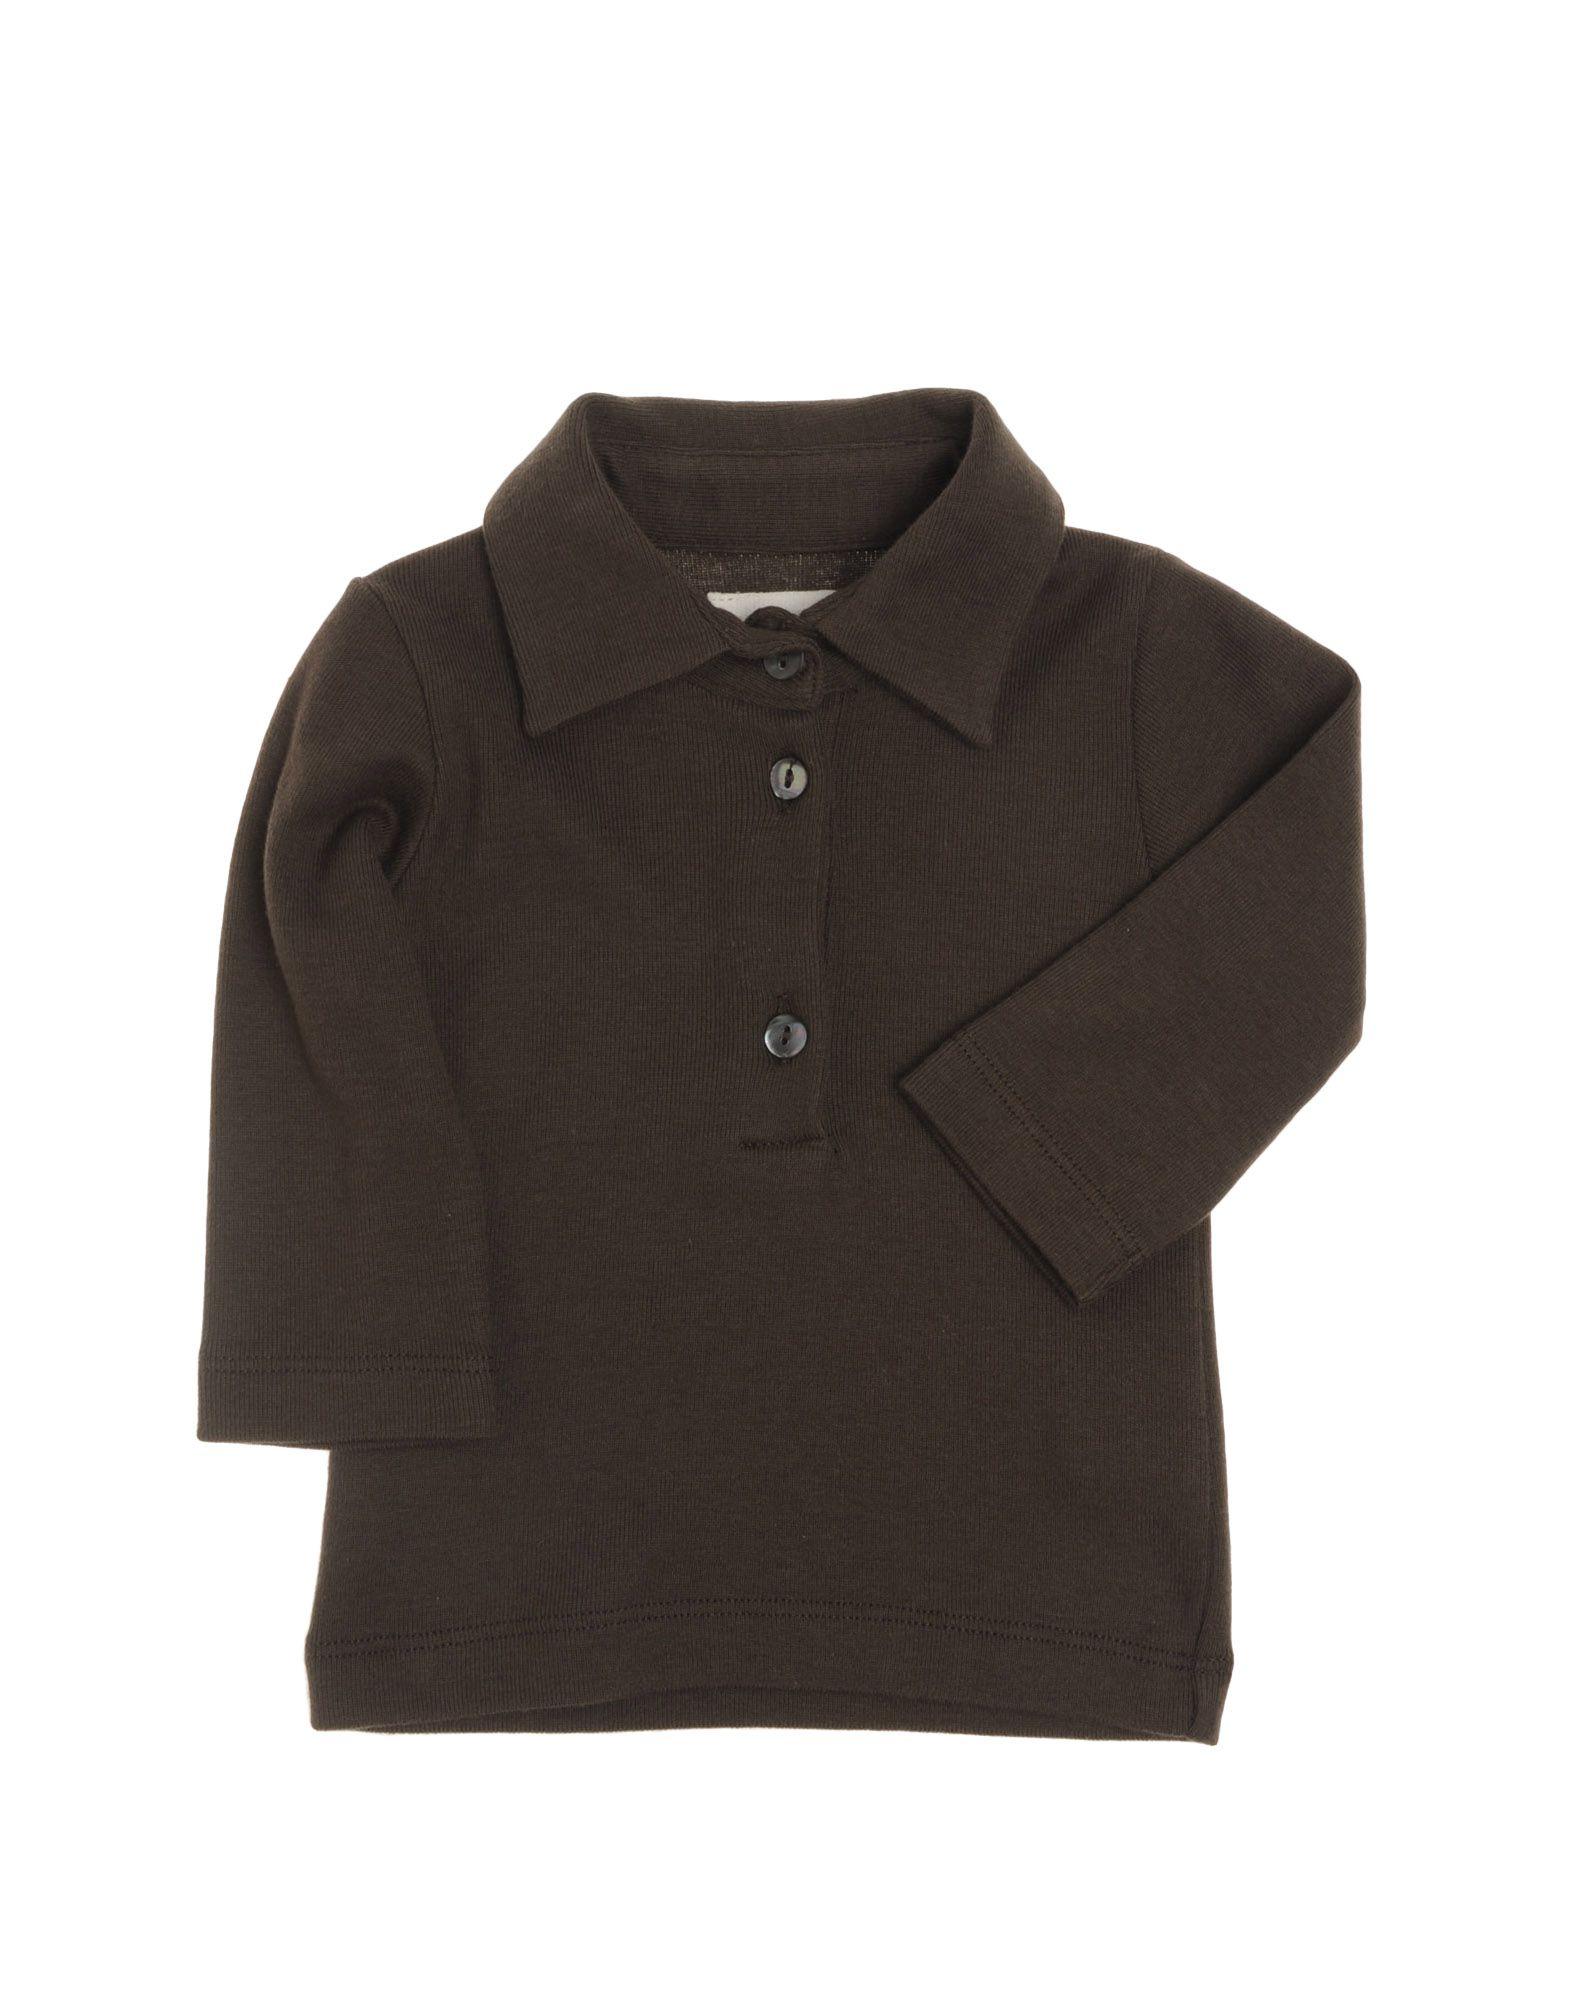 DOUUOD Mädchen 0-24 monate Poloshirt Farbe Dunkelbraun Größe 2